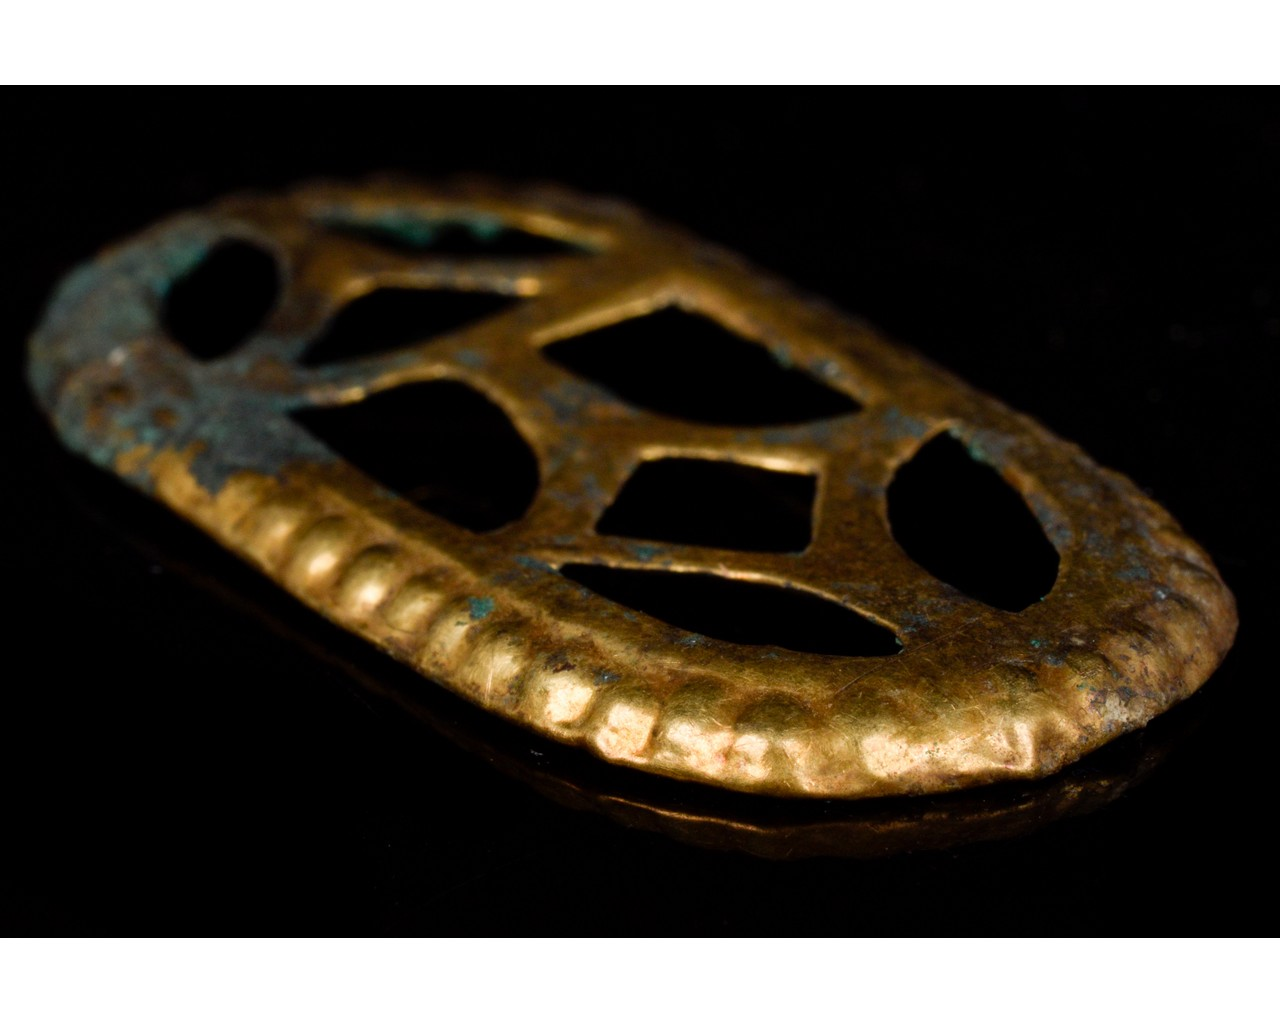 MEROVINGIAN GILDED BRONZE BELT FITTINGS SET - Image 6 of 8